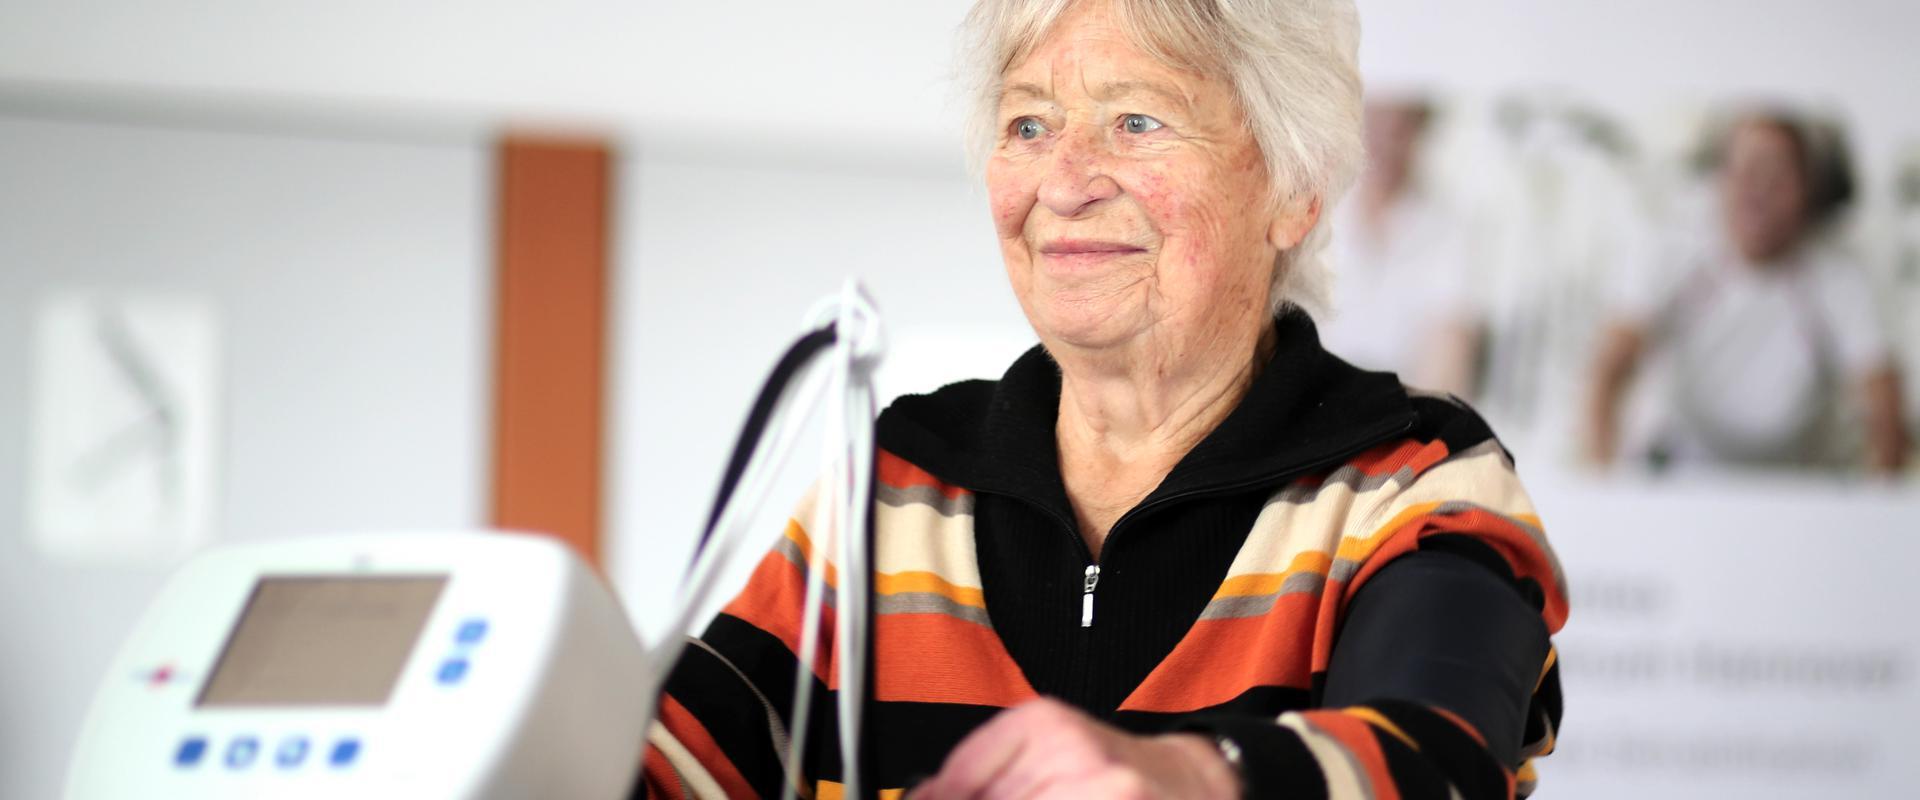 Kardiologie-Patientin in der MEDIAN Klinik Bad Gottleuba